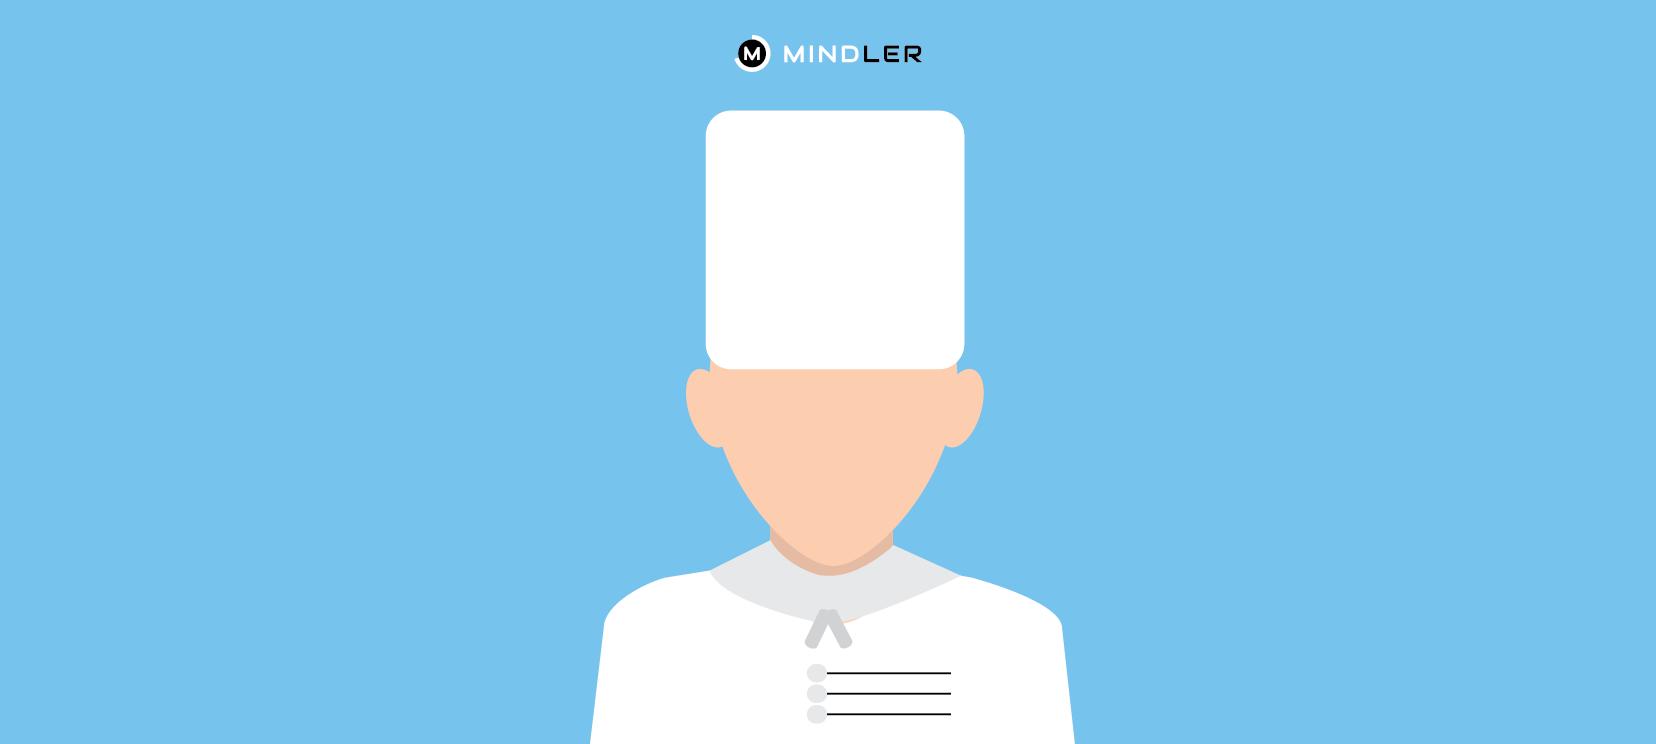 career-in-culinary-arts